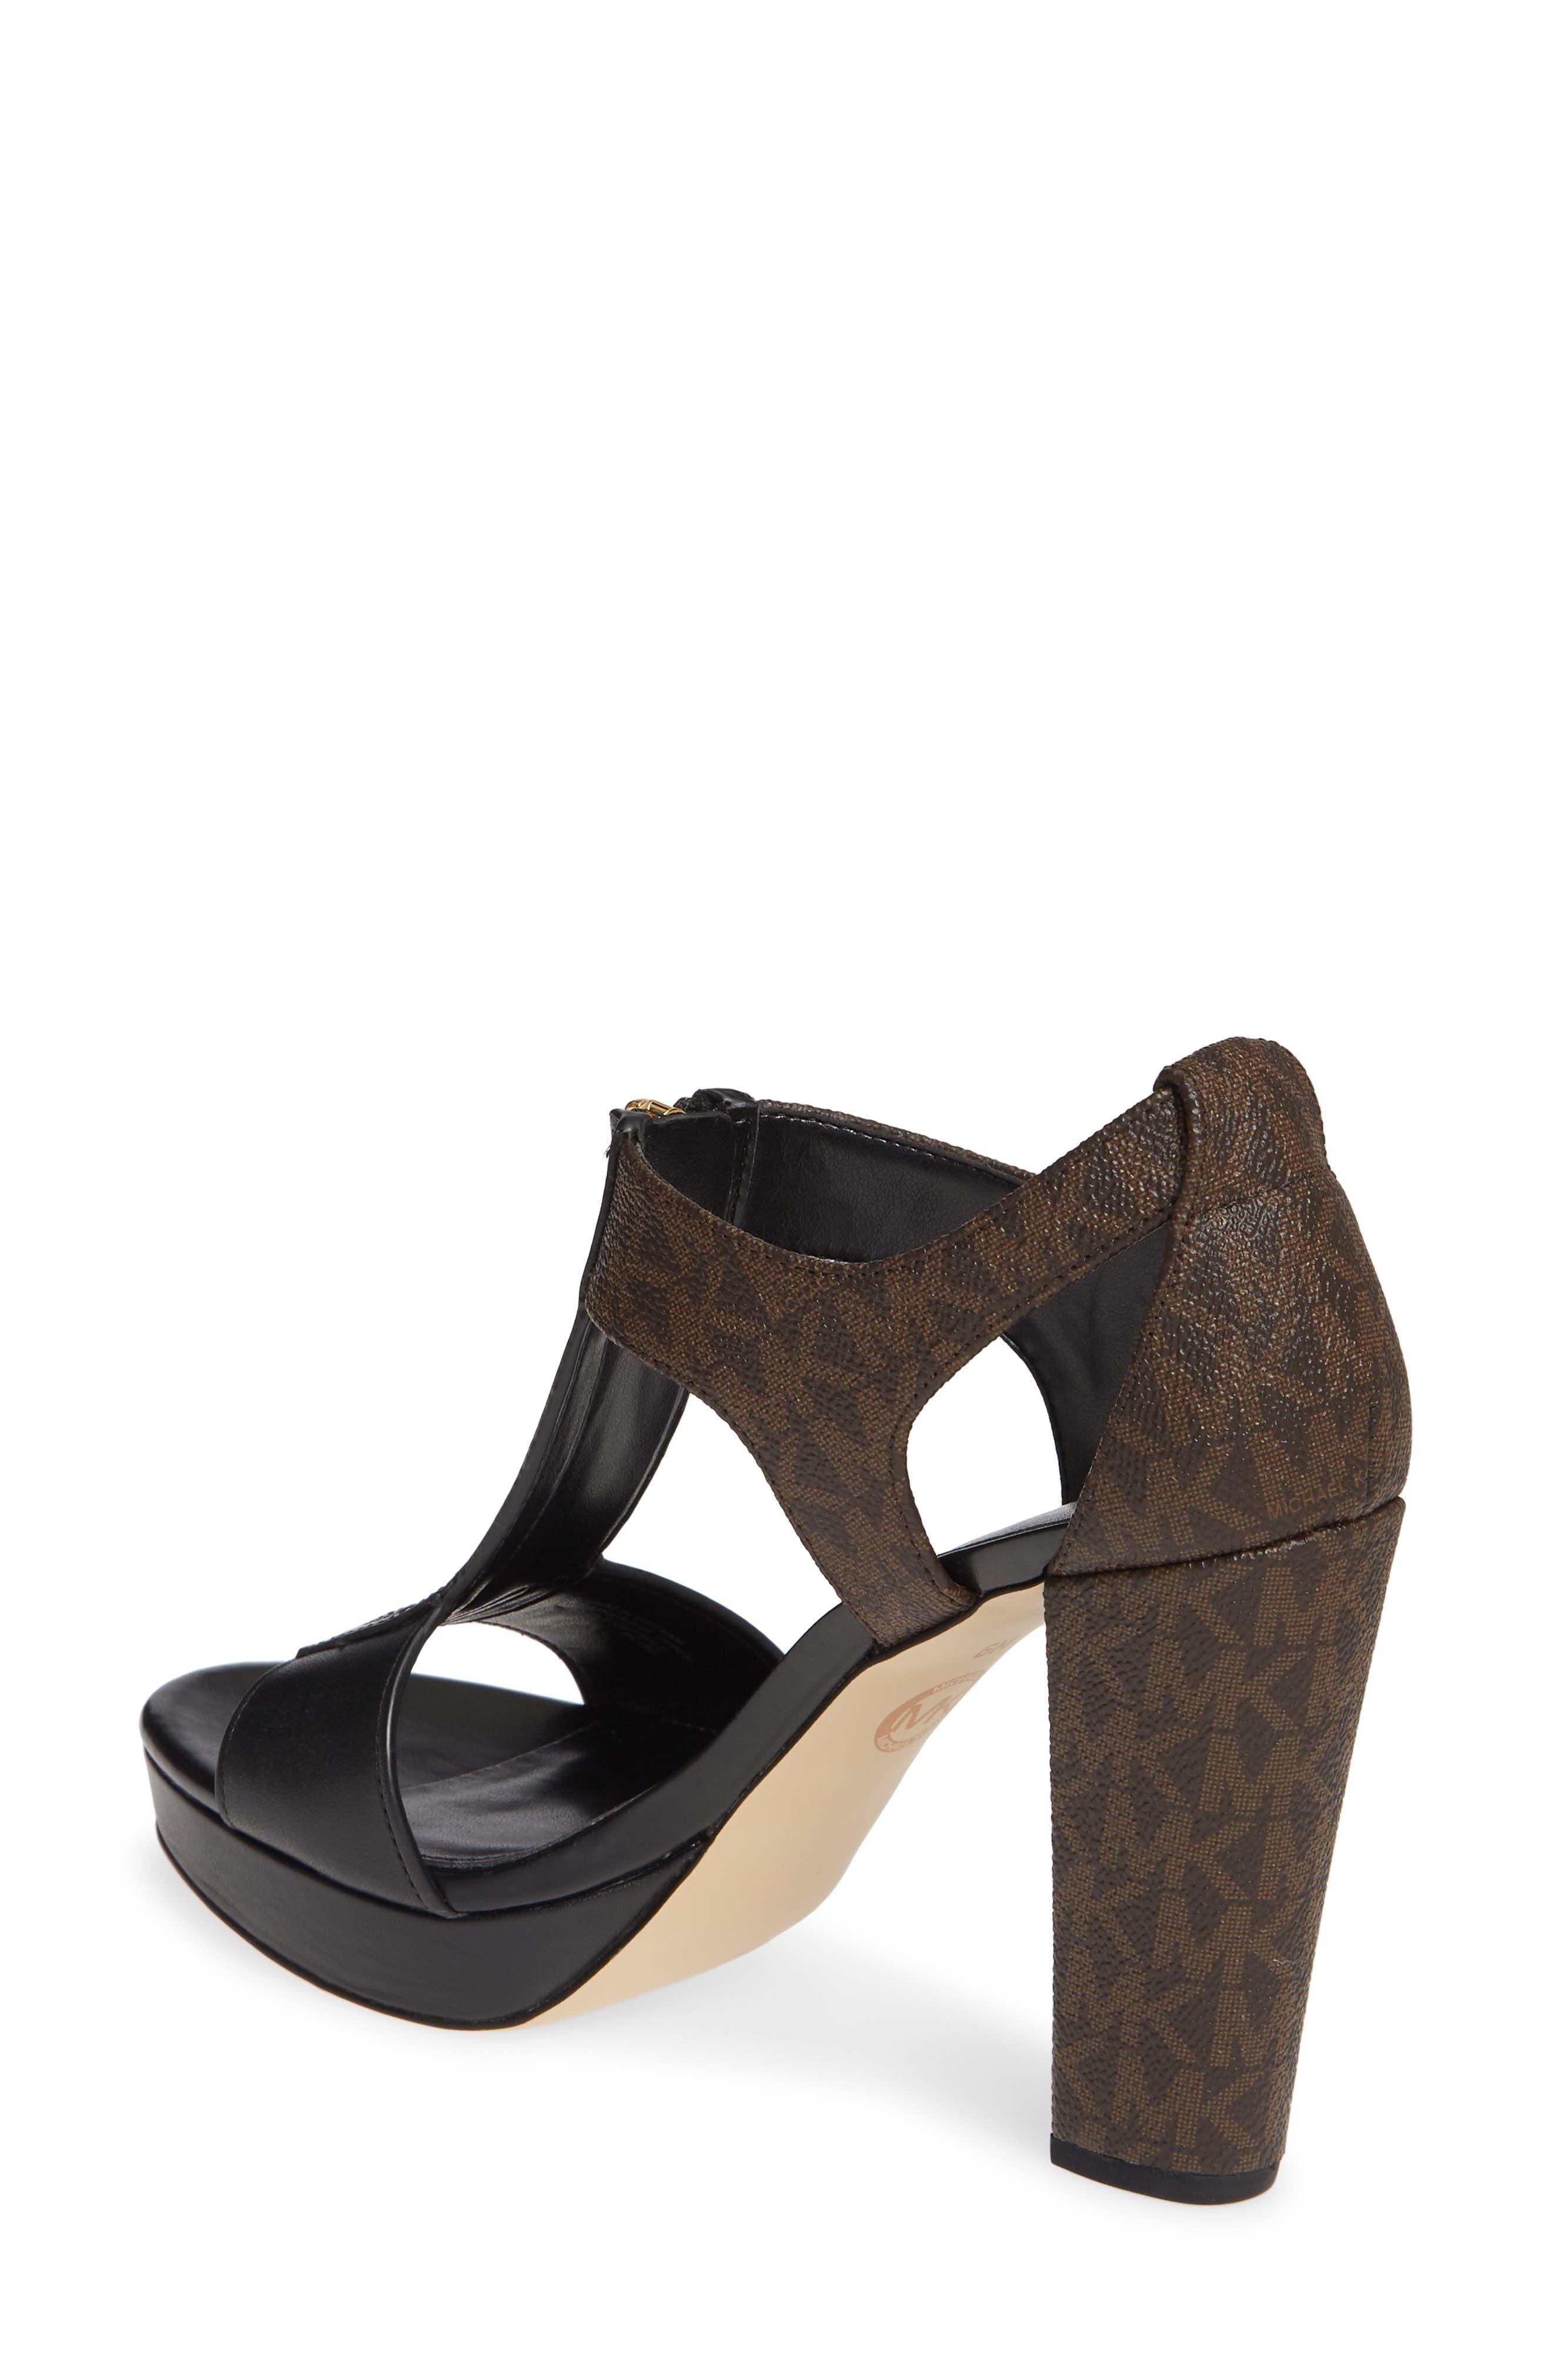 Women's MICHAEL Michael Kors Shoes | Nordstrom